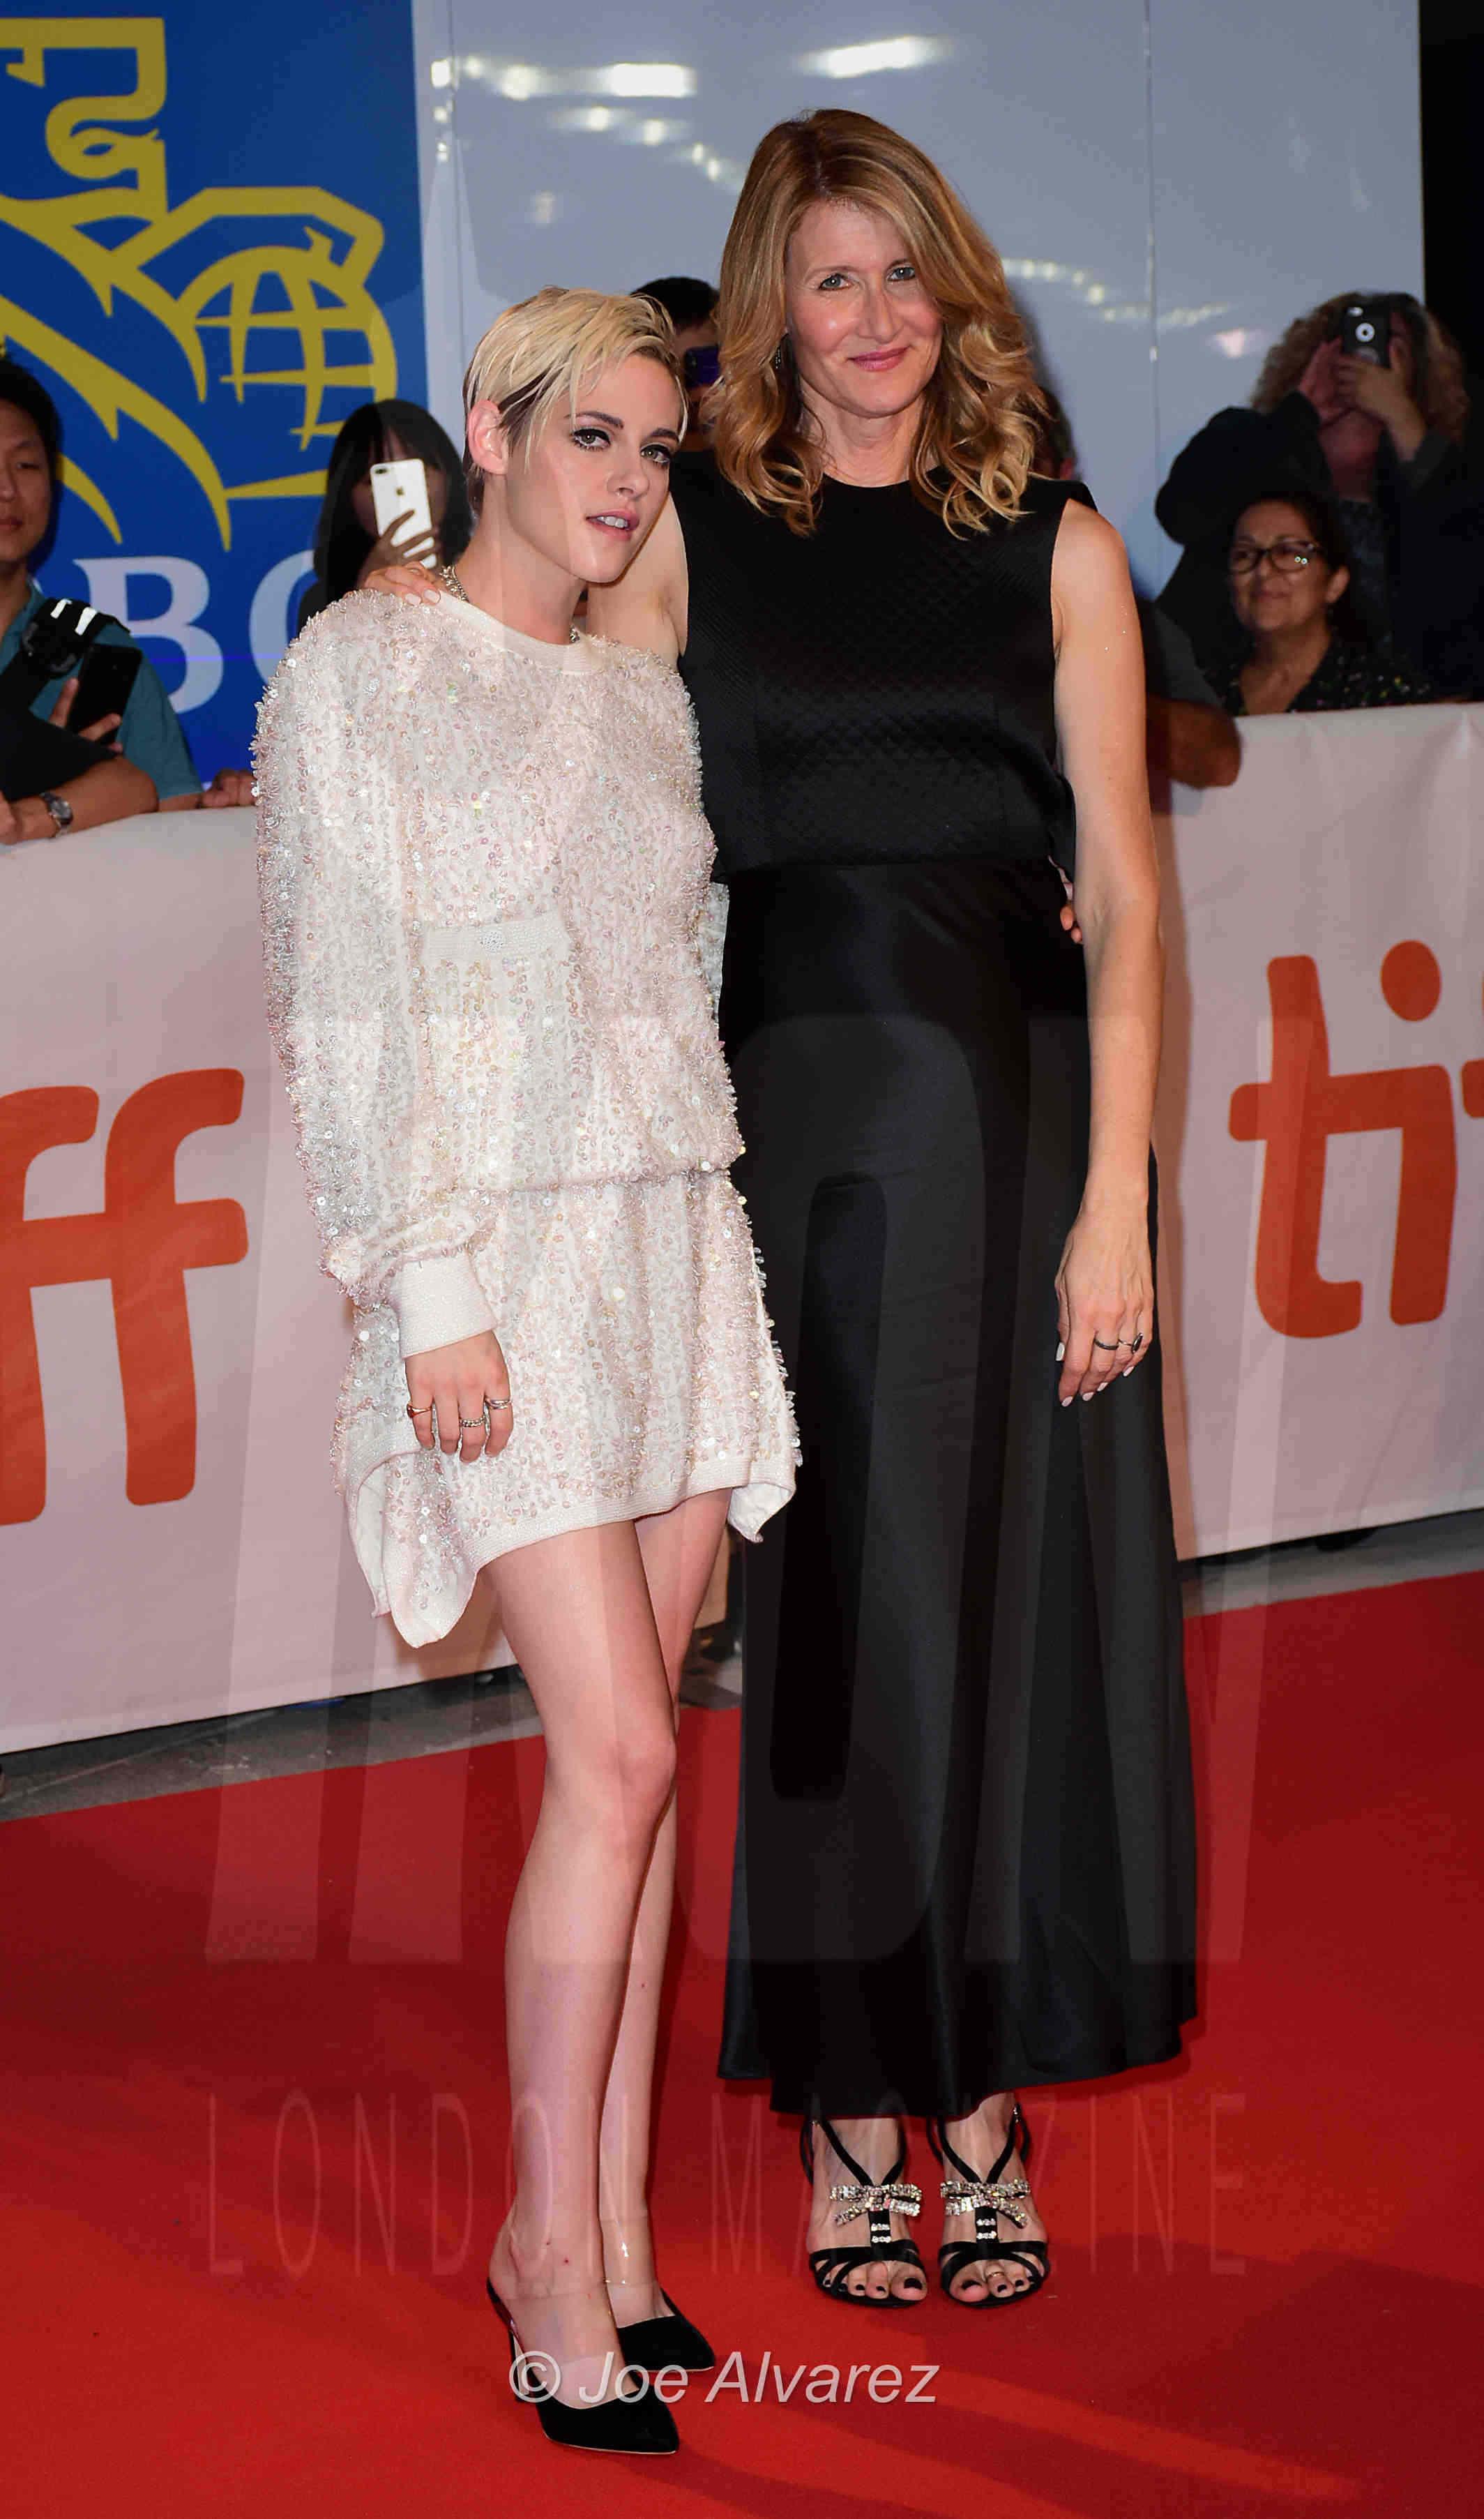 Kristen Stewart, Laura Dern Jeremiah Terminator LeRoy Toronto premiere © Joe Alvarez